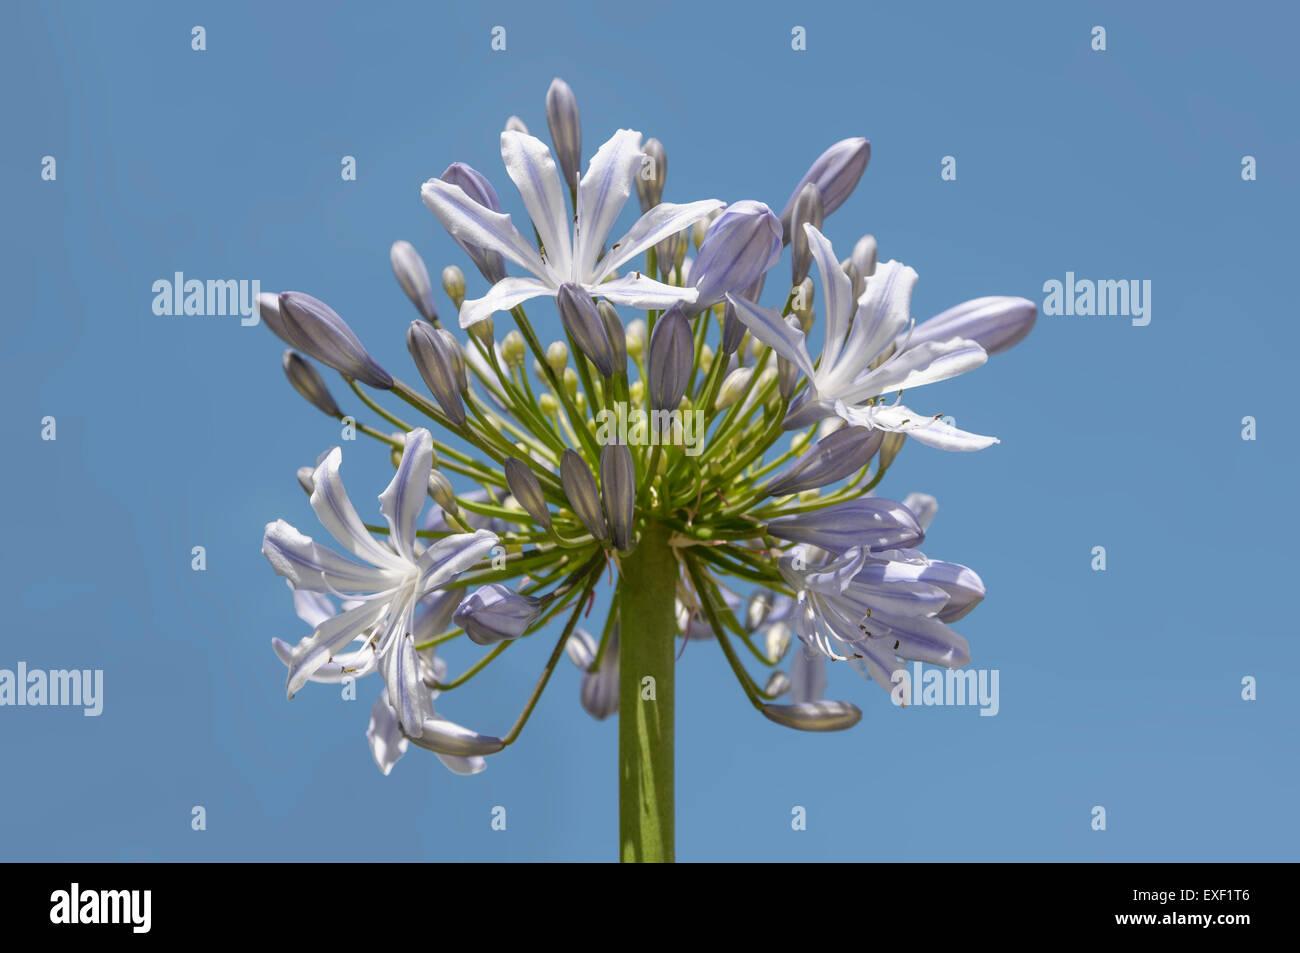 Agapanthus flower set against a blue sky Stock Photo